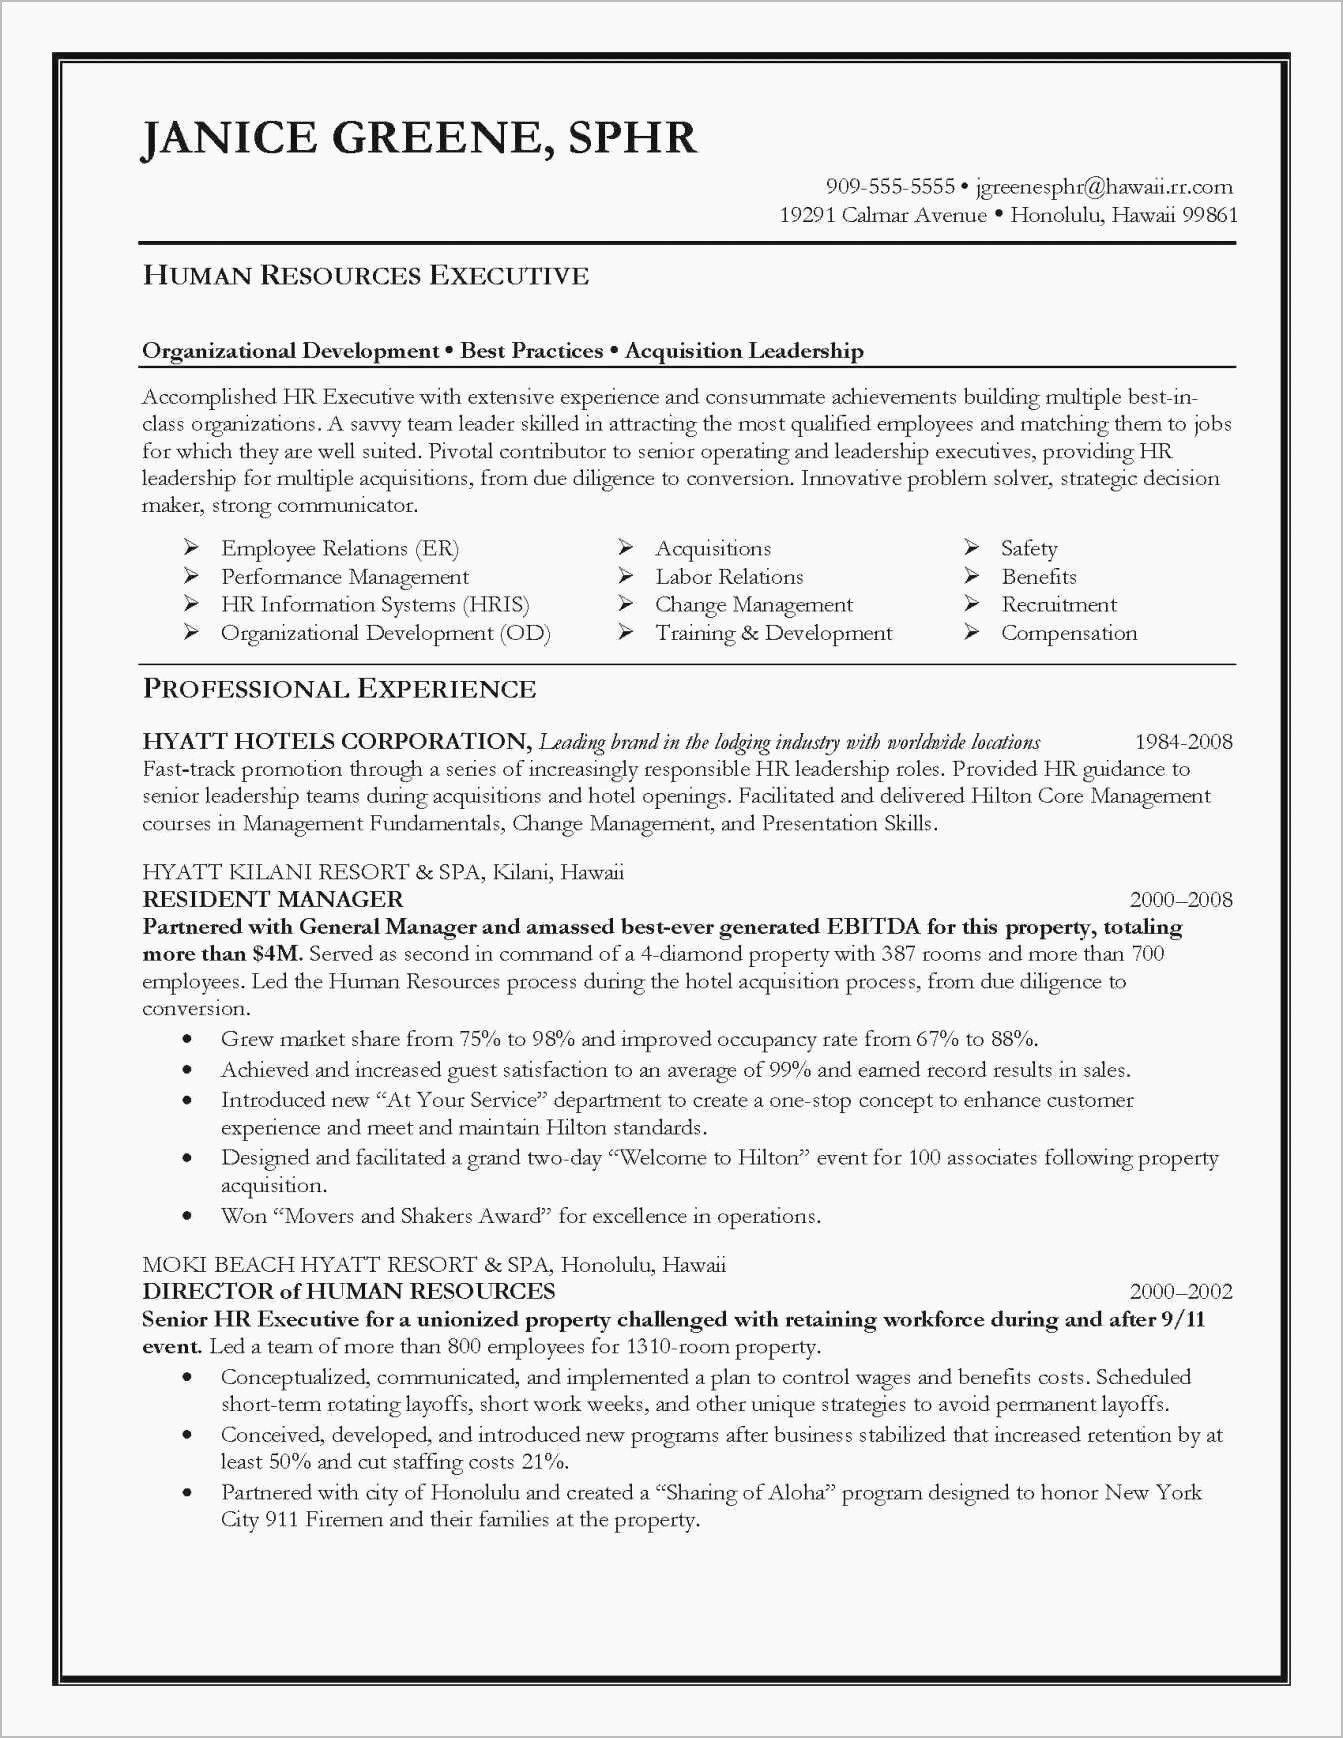 Resume Writer Jobs Near Me